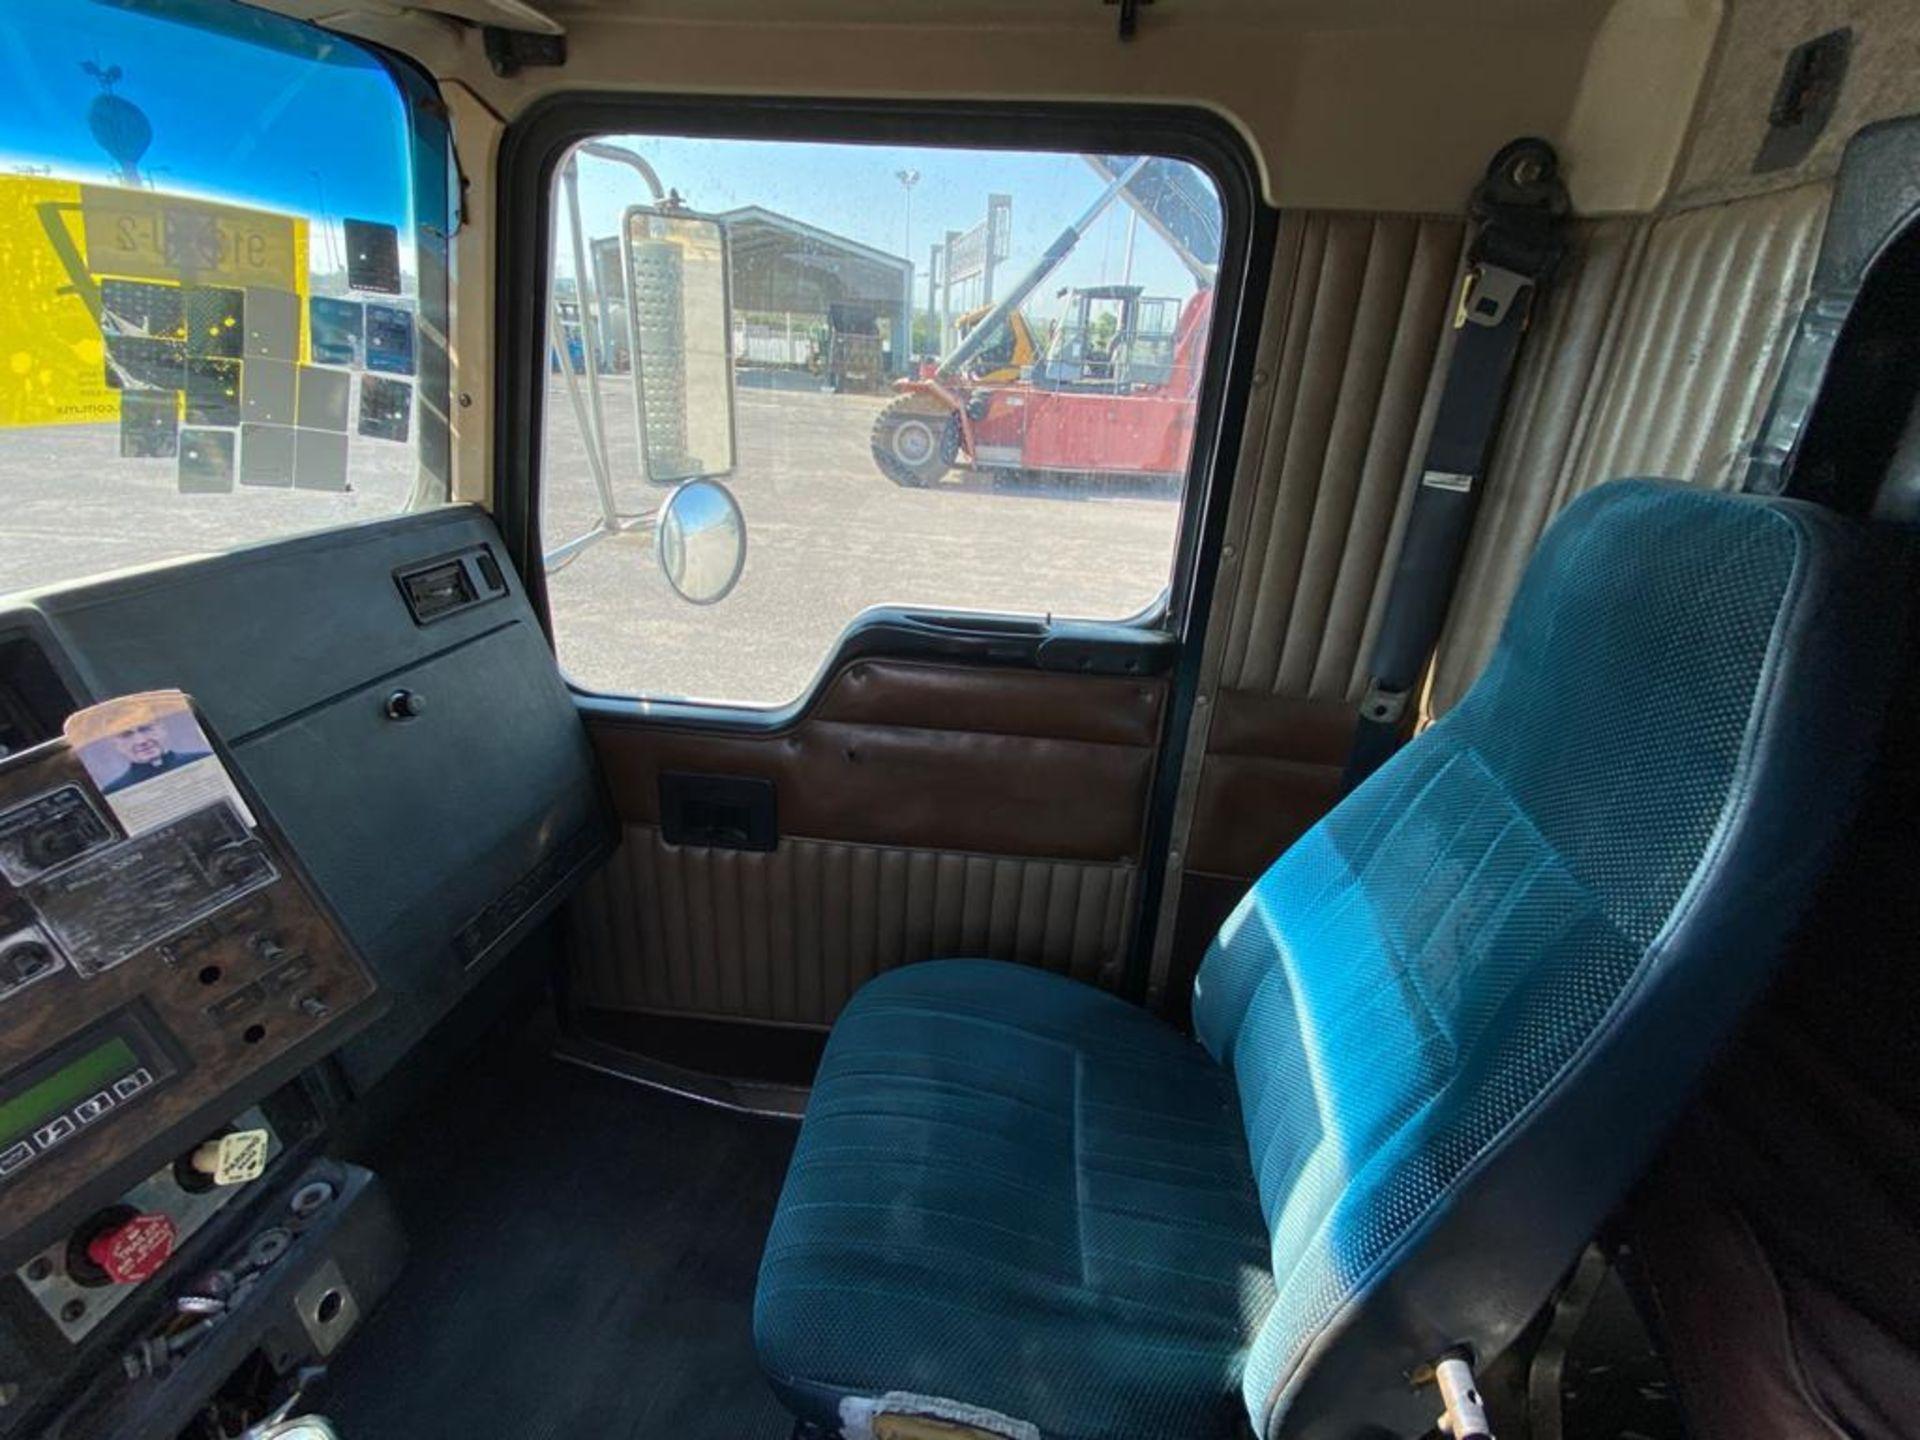 1998 Kenworth Sleeper Truck Tractor, standard transmission of 18 speeds - Image 29 of 55